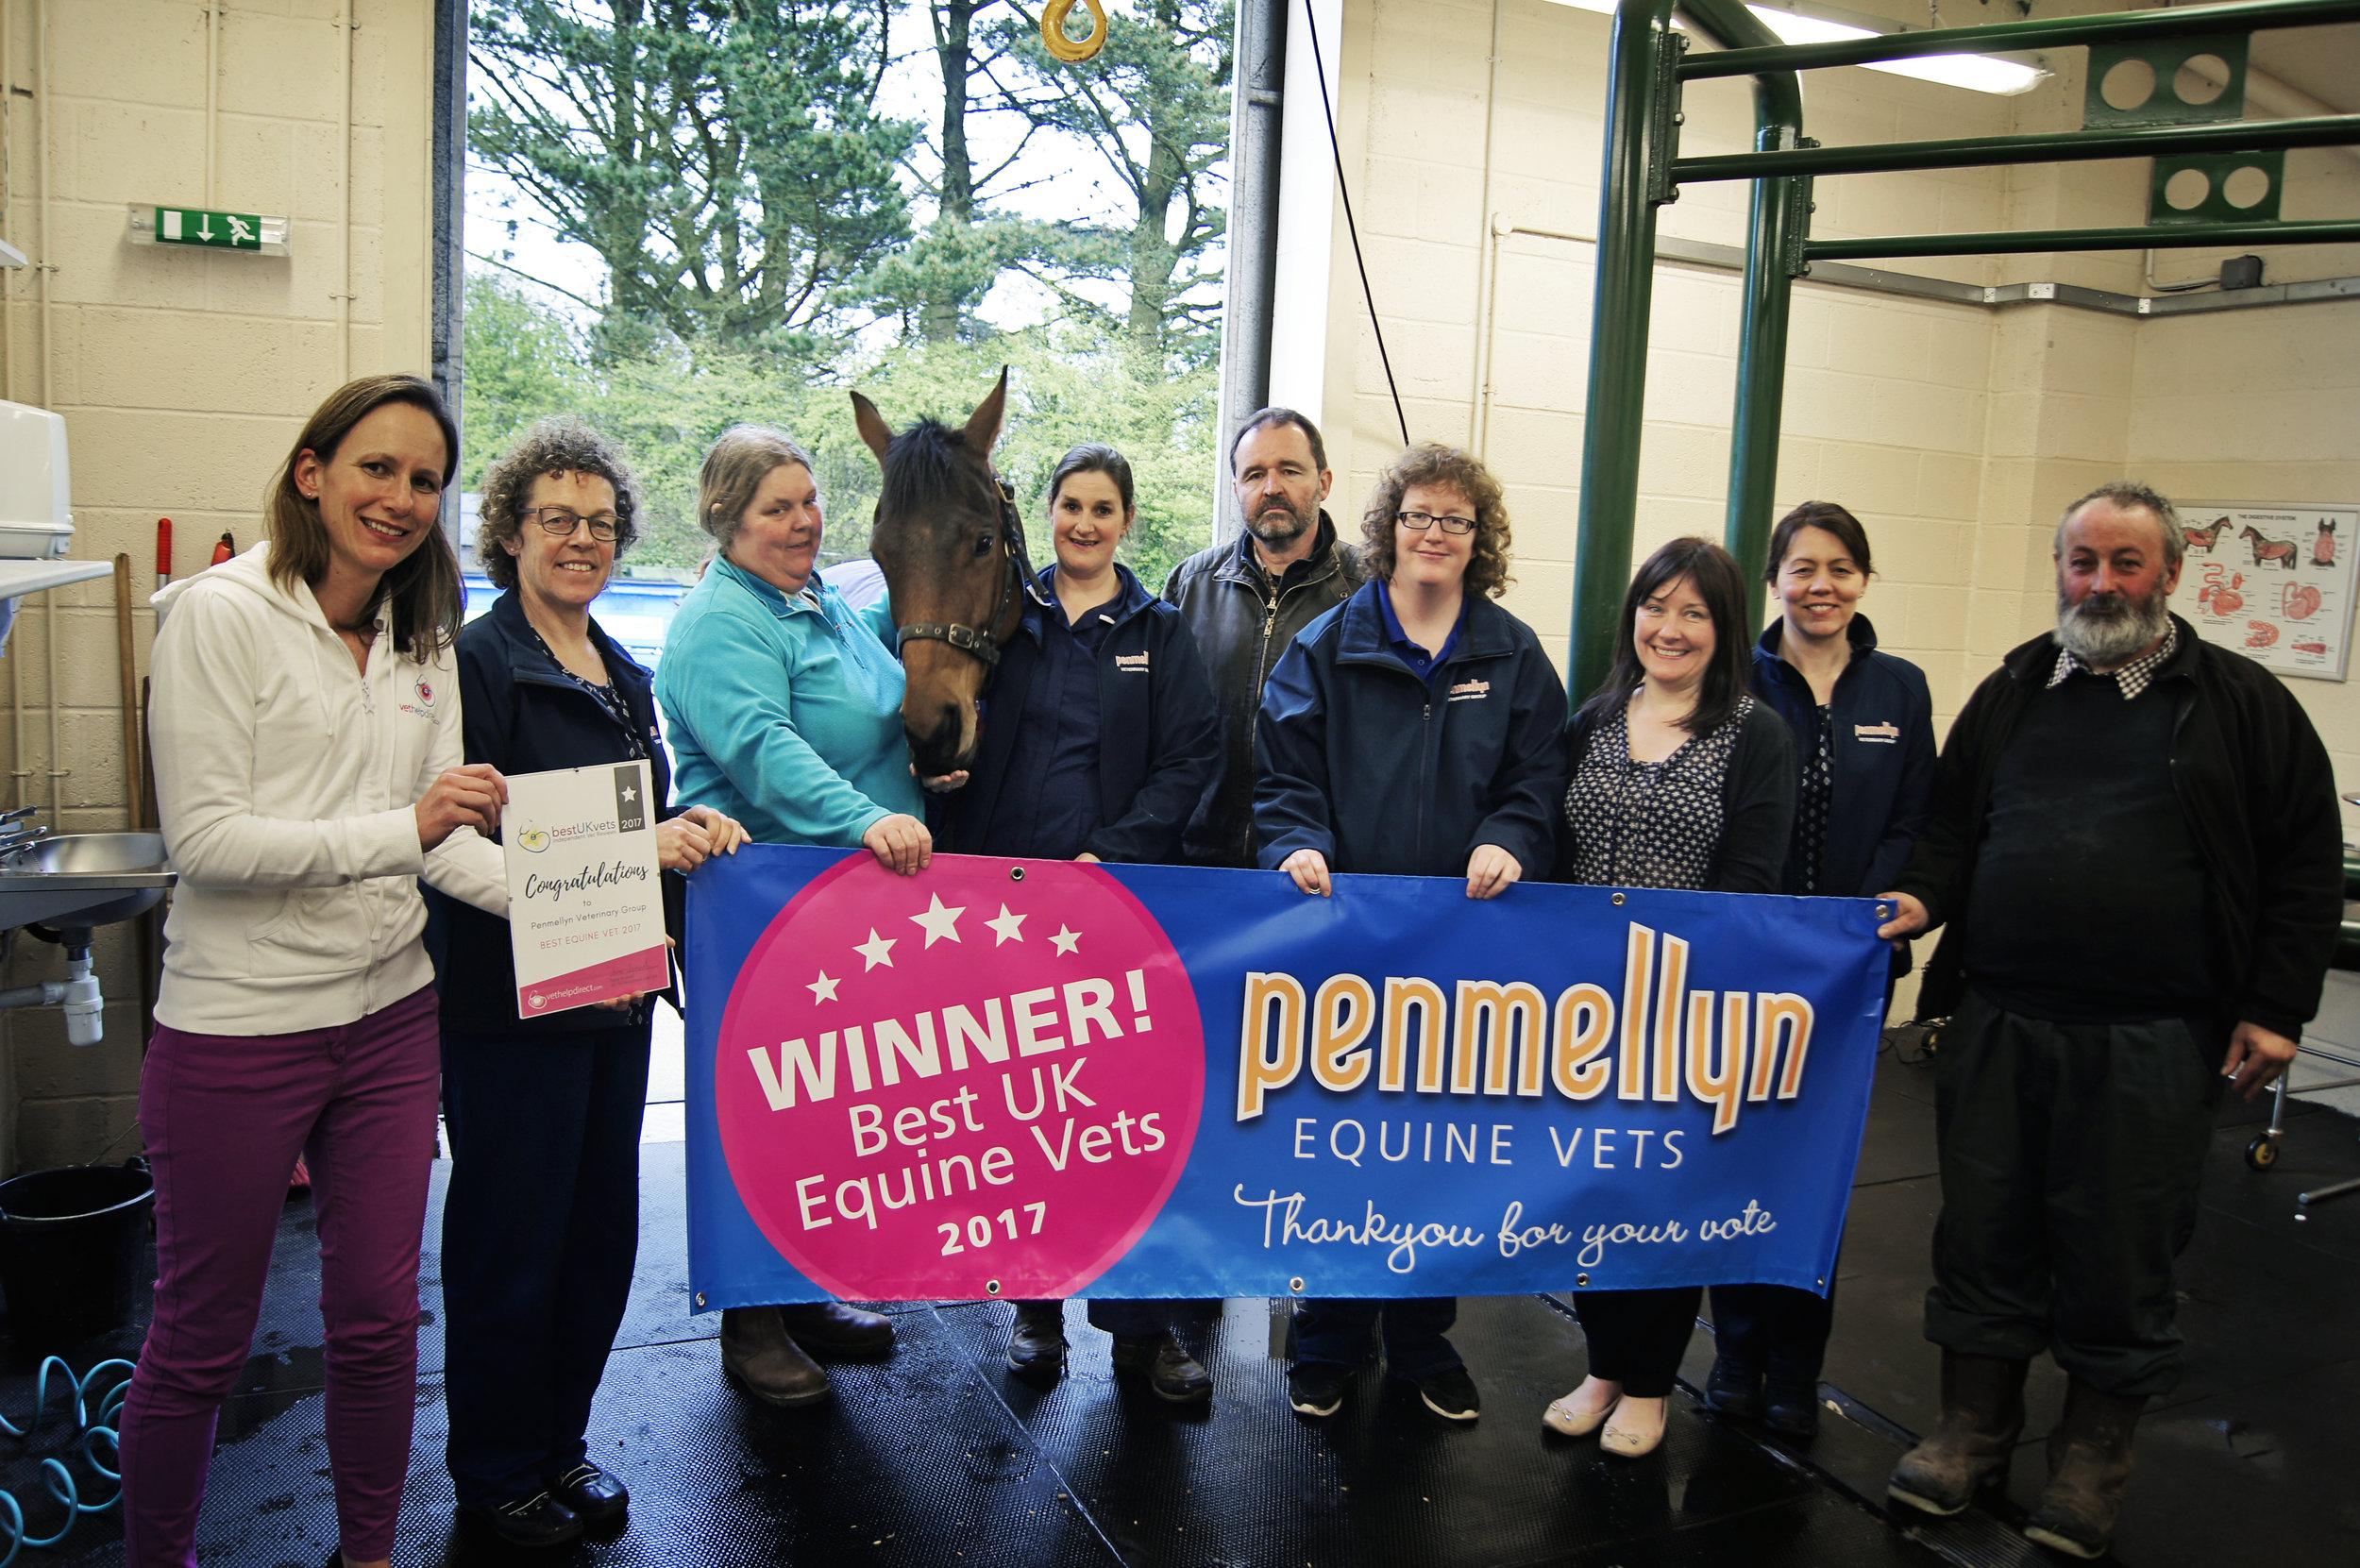 Penmellyn Vets' equine team receiving certificate for Best Equine Vets from Susie Samuel.